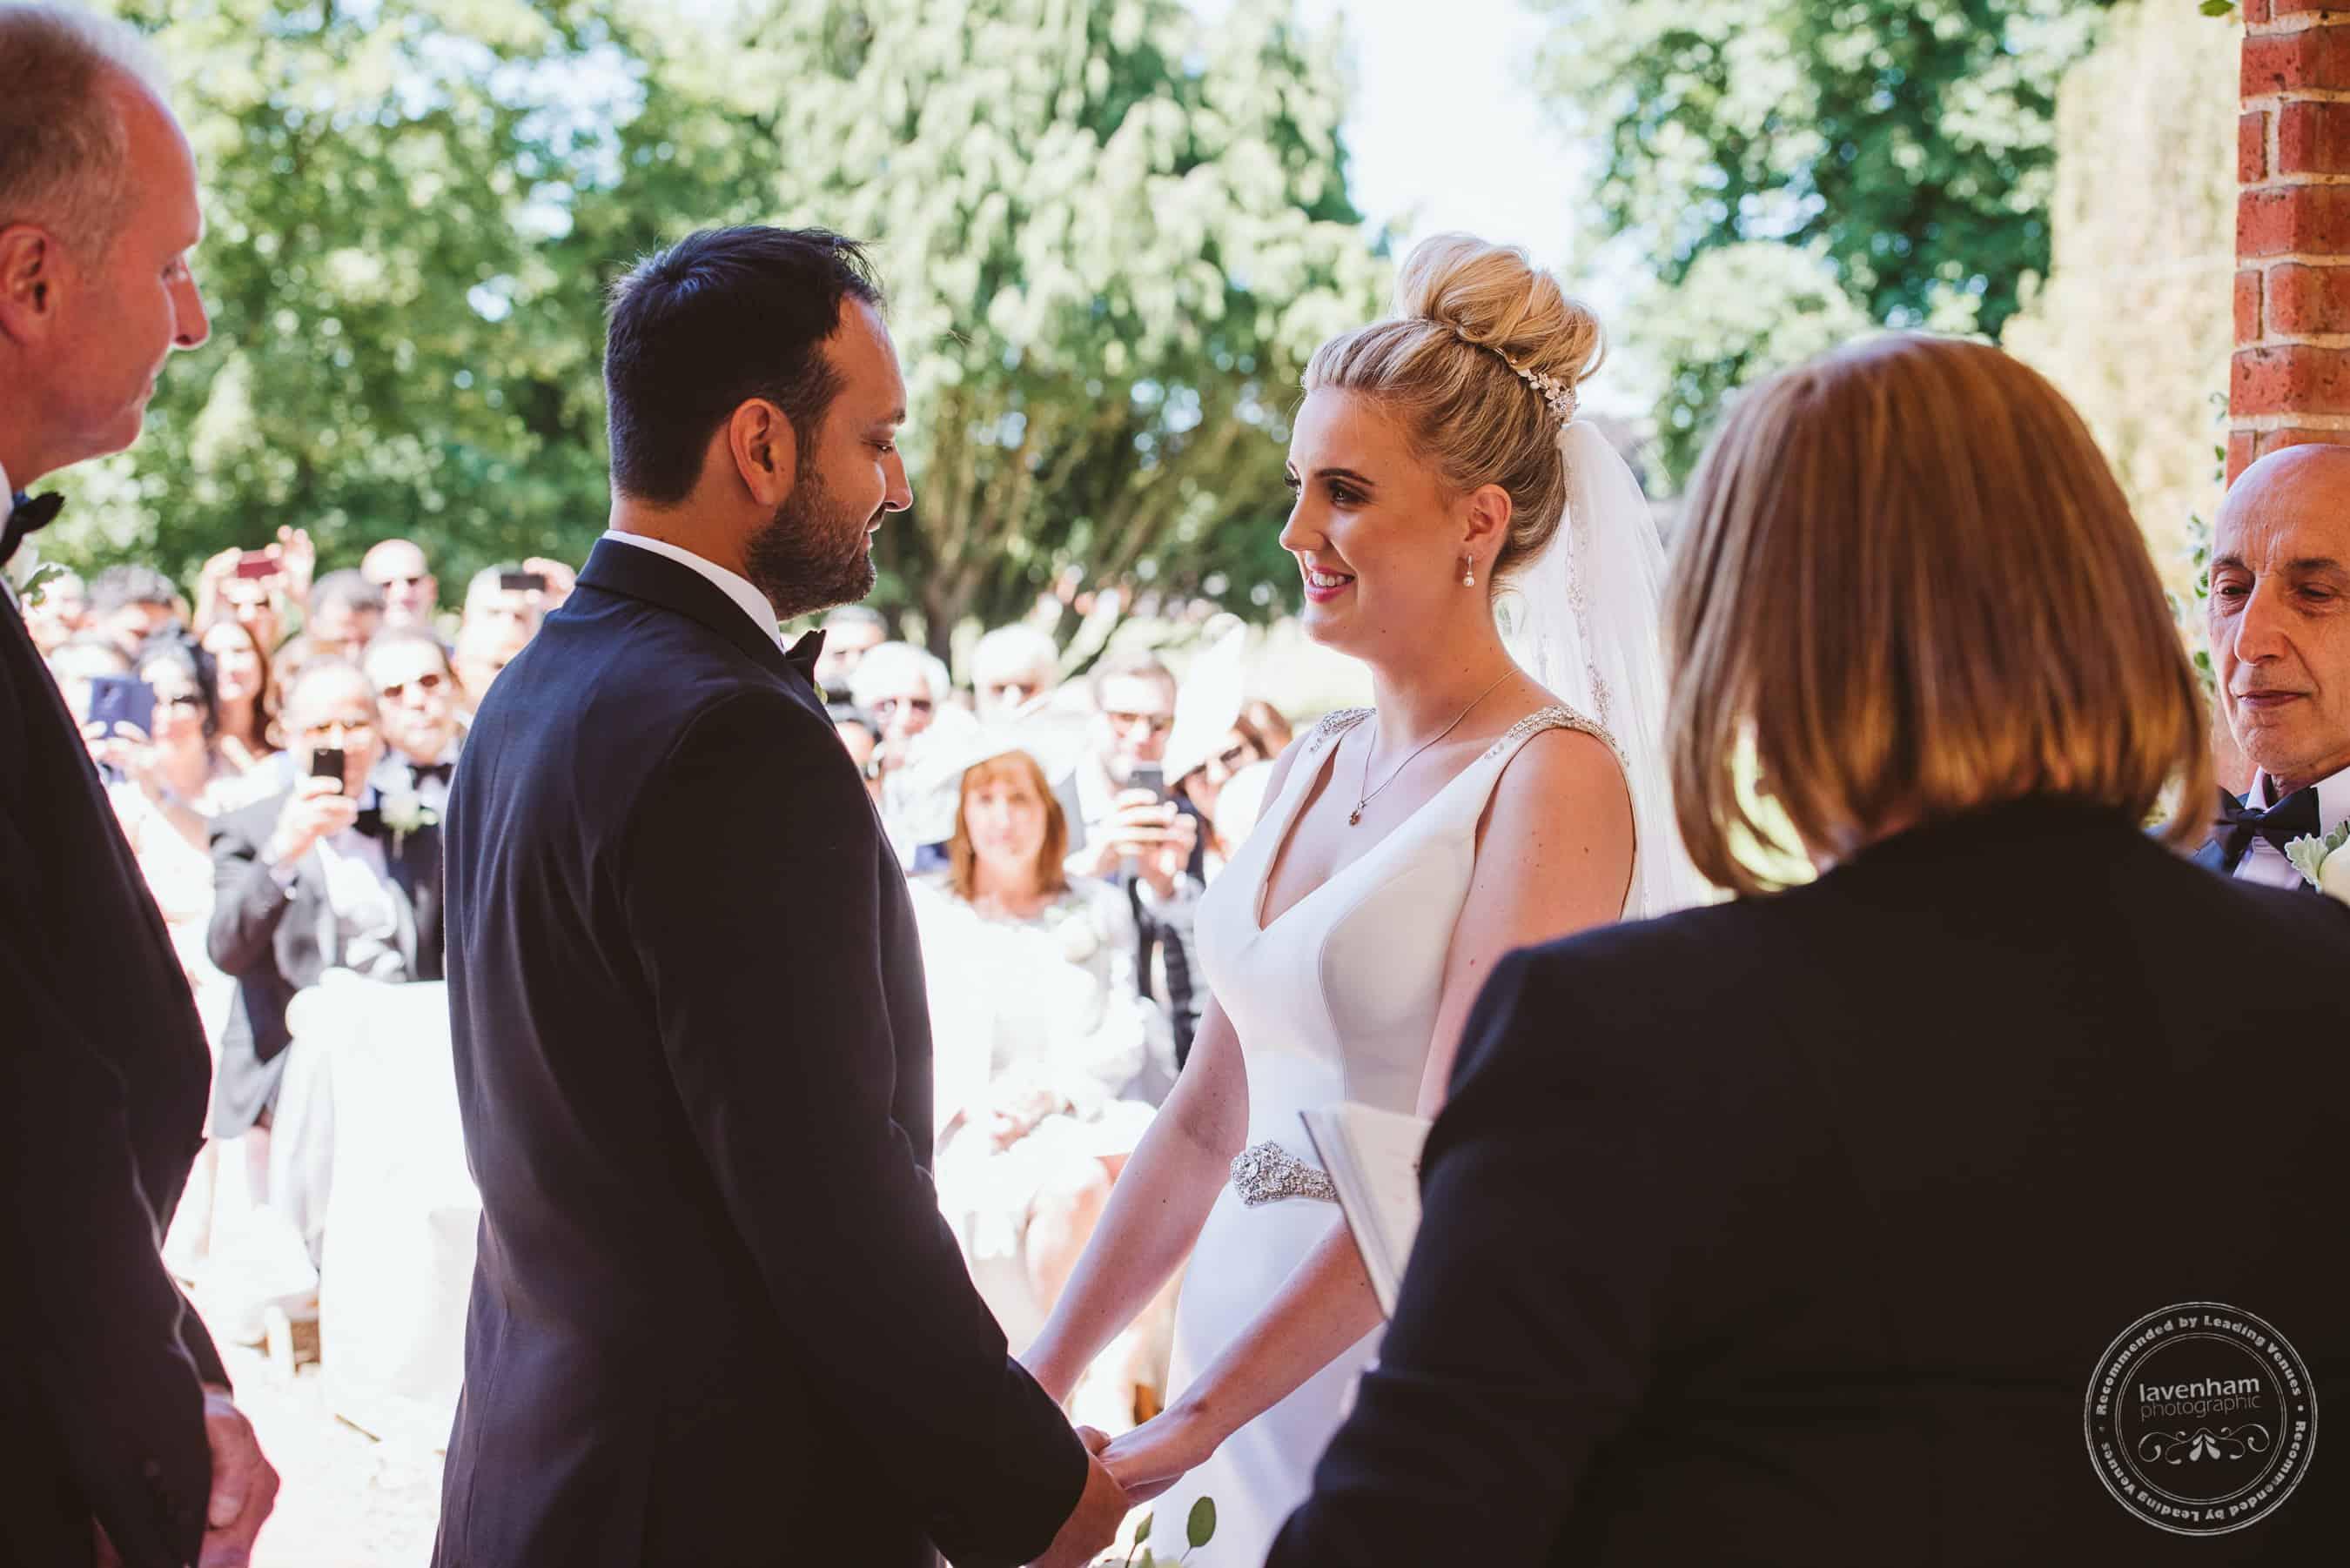 220618 Gosfield Hall Wedding Photography Lavenham Photographic 0075